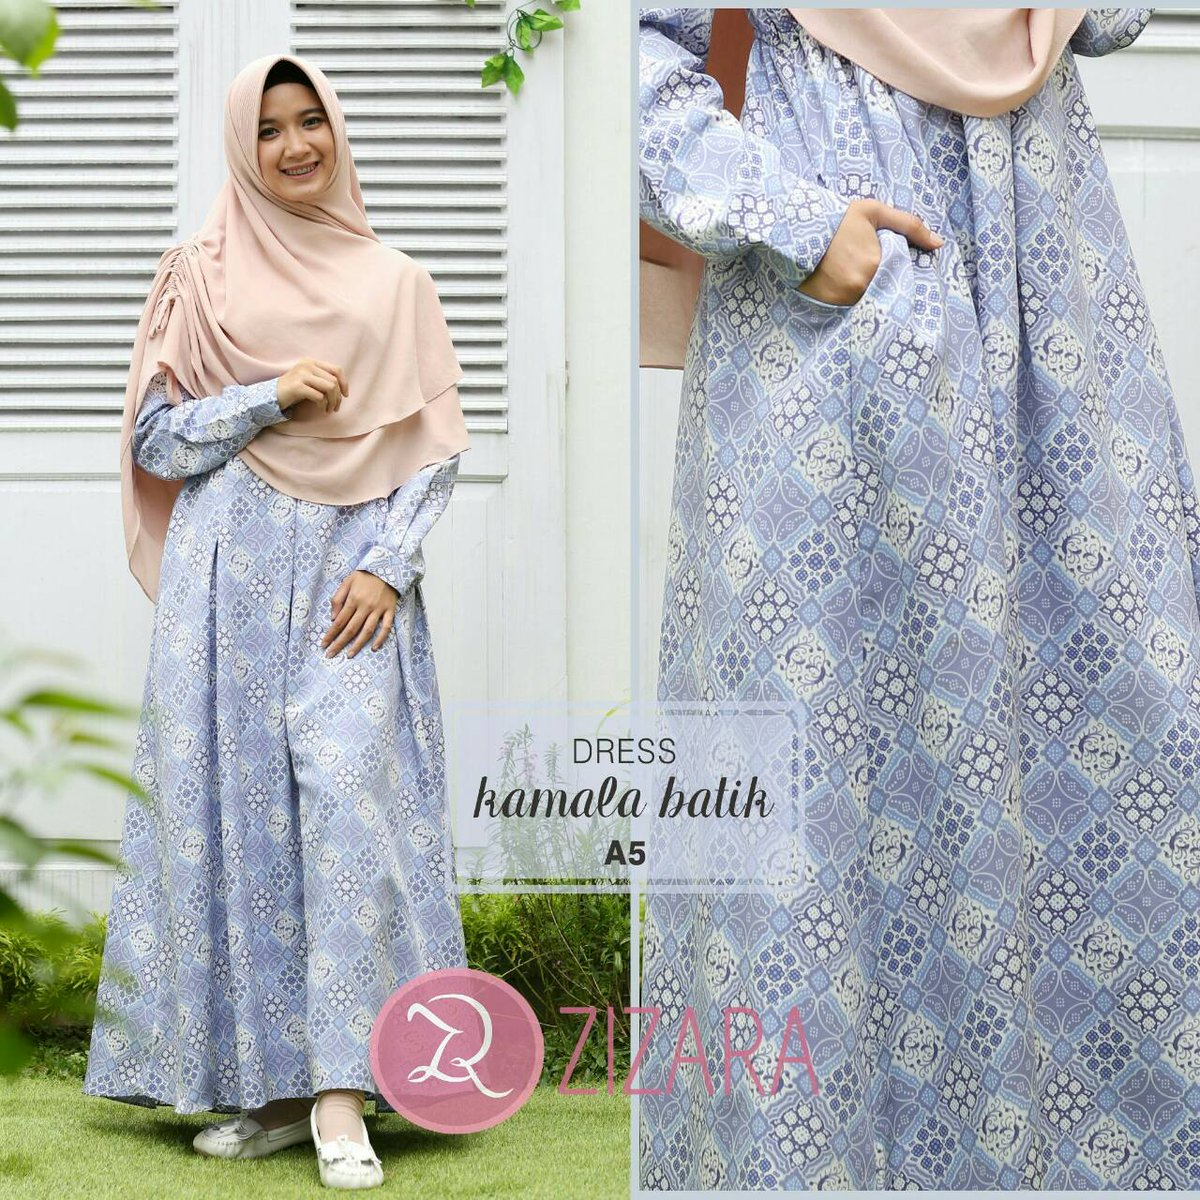 Free Ongkir Shopee On Twitter Kamala Motif Dress By Zizara Gamis Only Bahan Balodior Size S M L Idr 210000 Wa 085770494701 Kamismanis